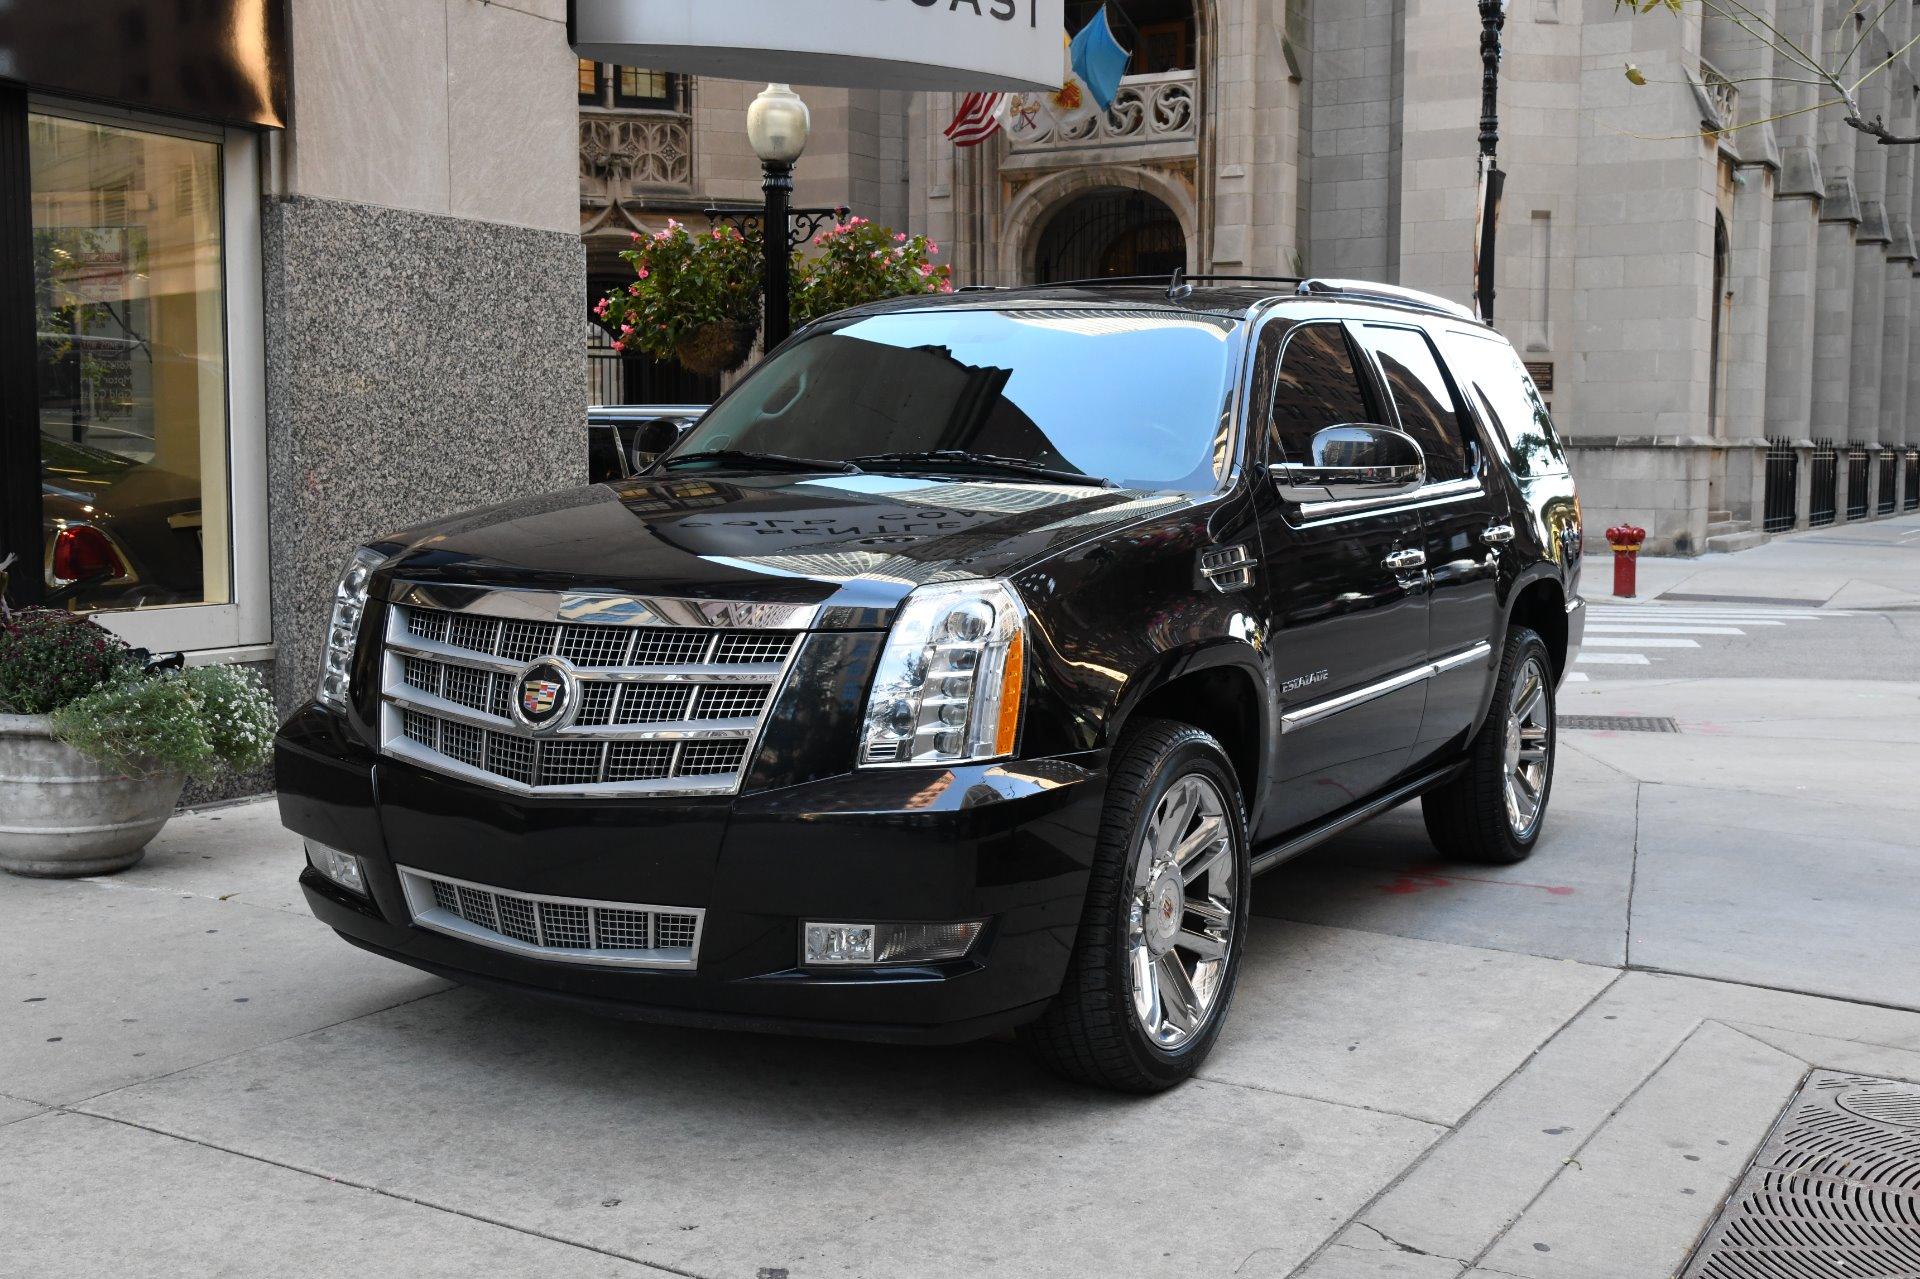 2013 Cadillac Escalade For Sale >> 2013 Cadillac Escalade Platinum Edition Stock L438e For